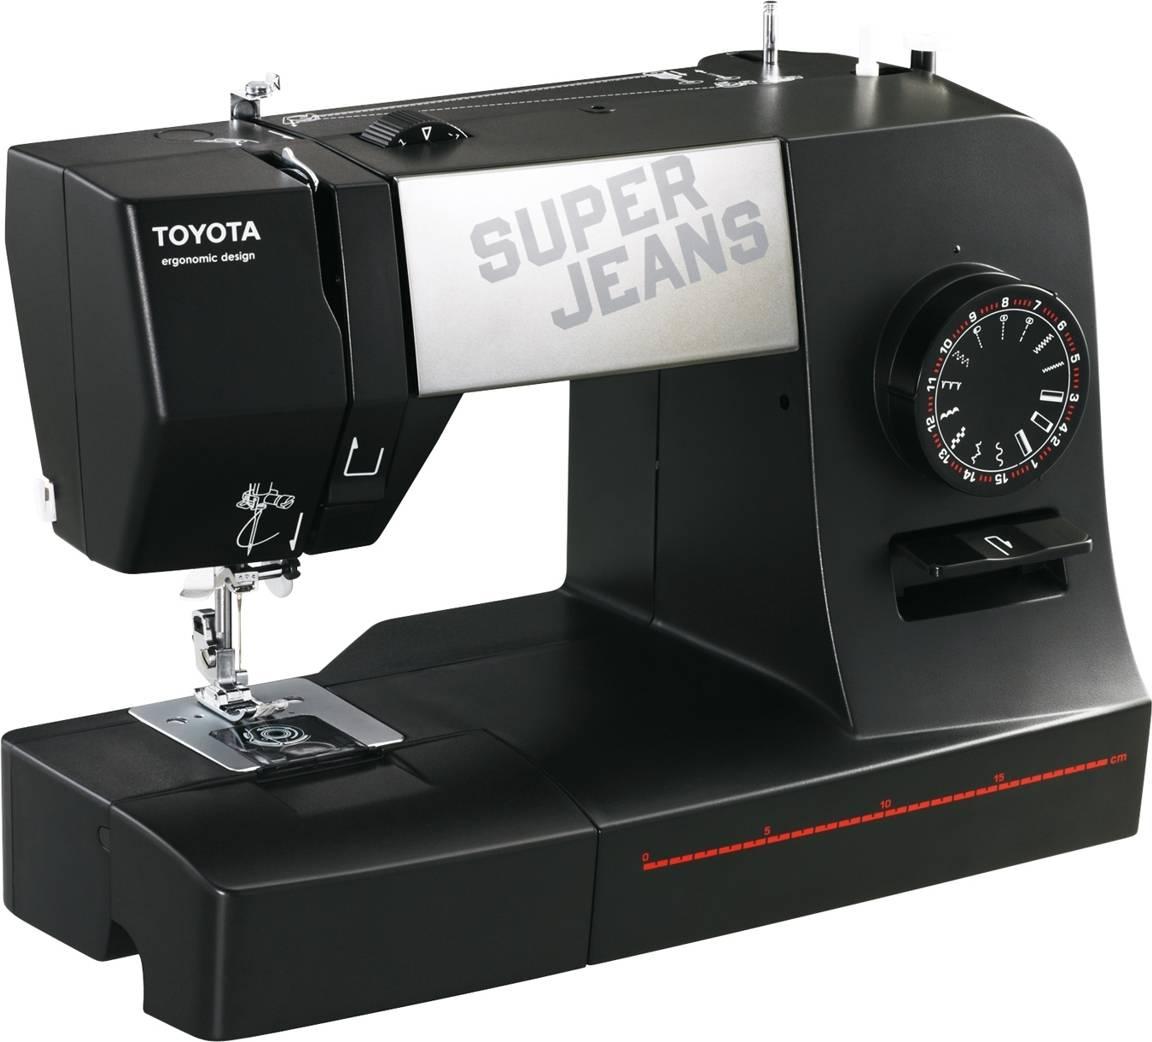 Šicí stroj Super J15 - Black J15B TOYOTA